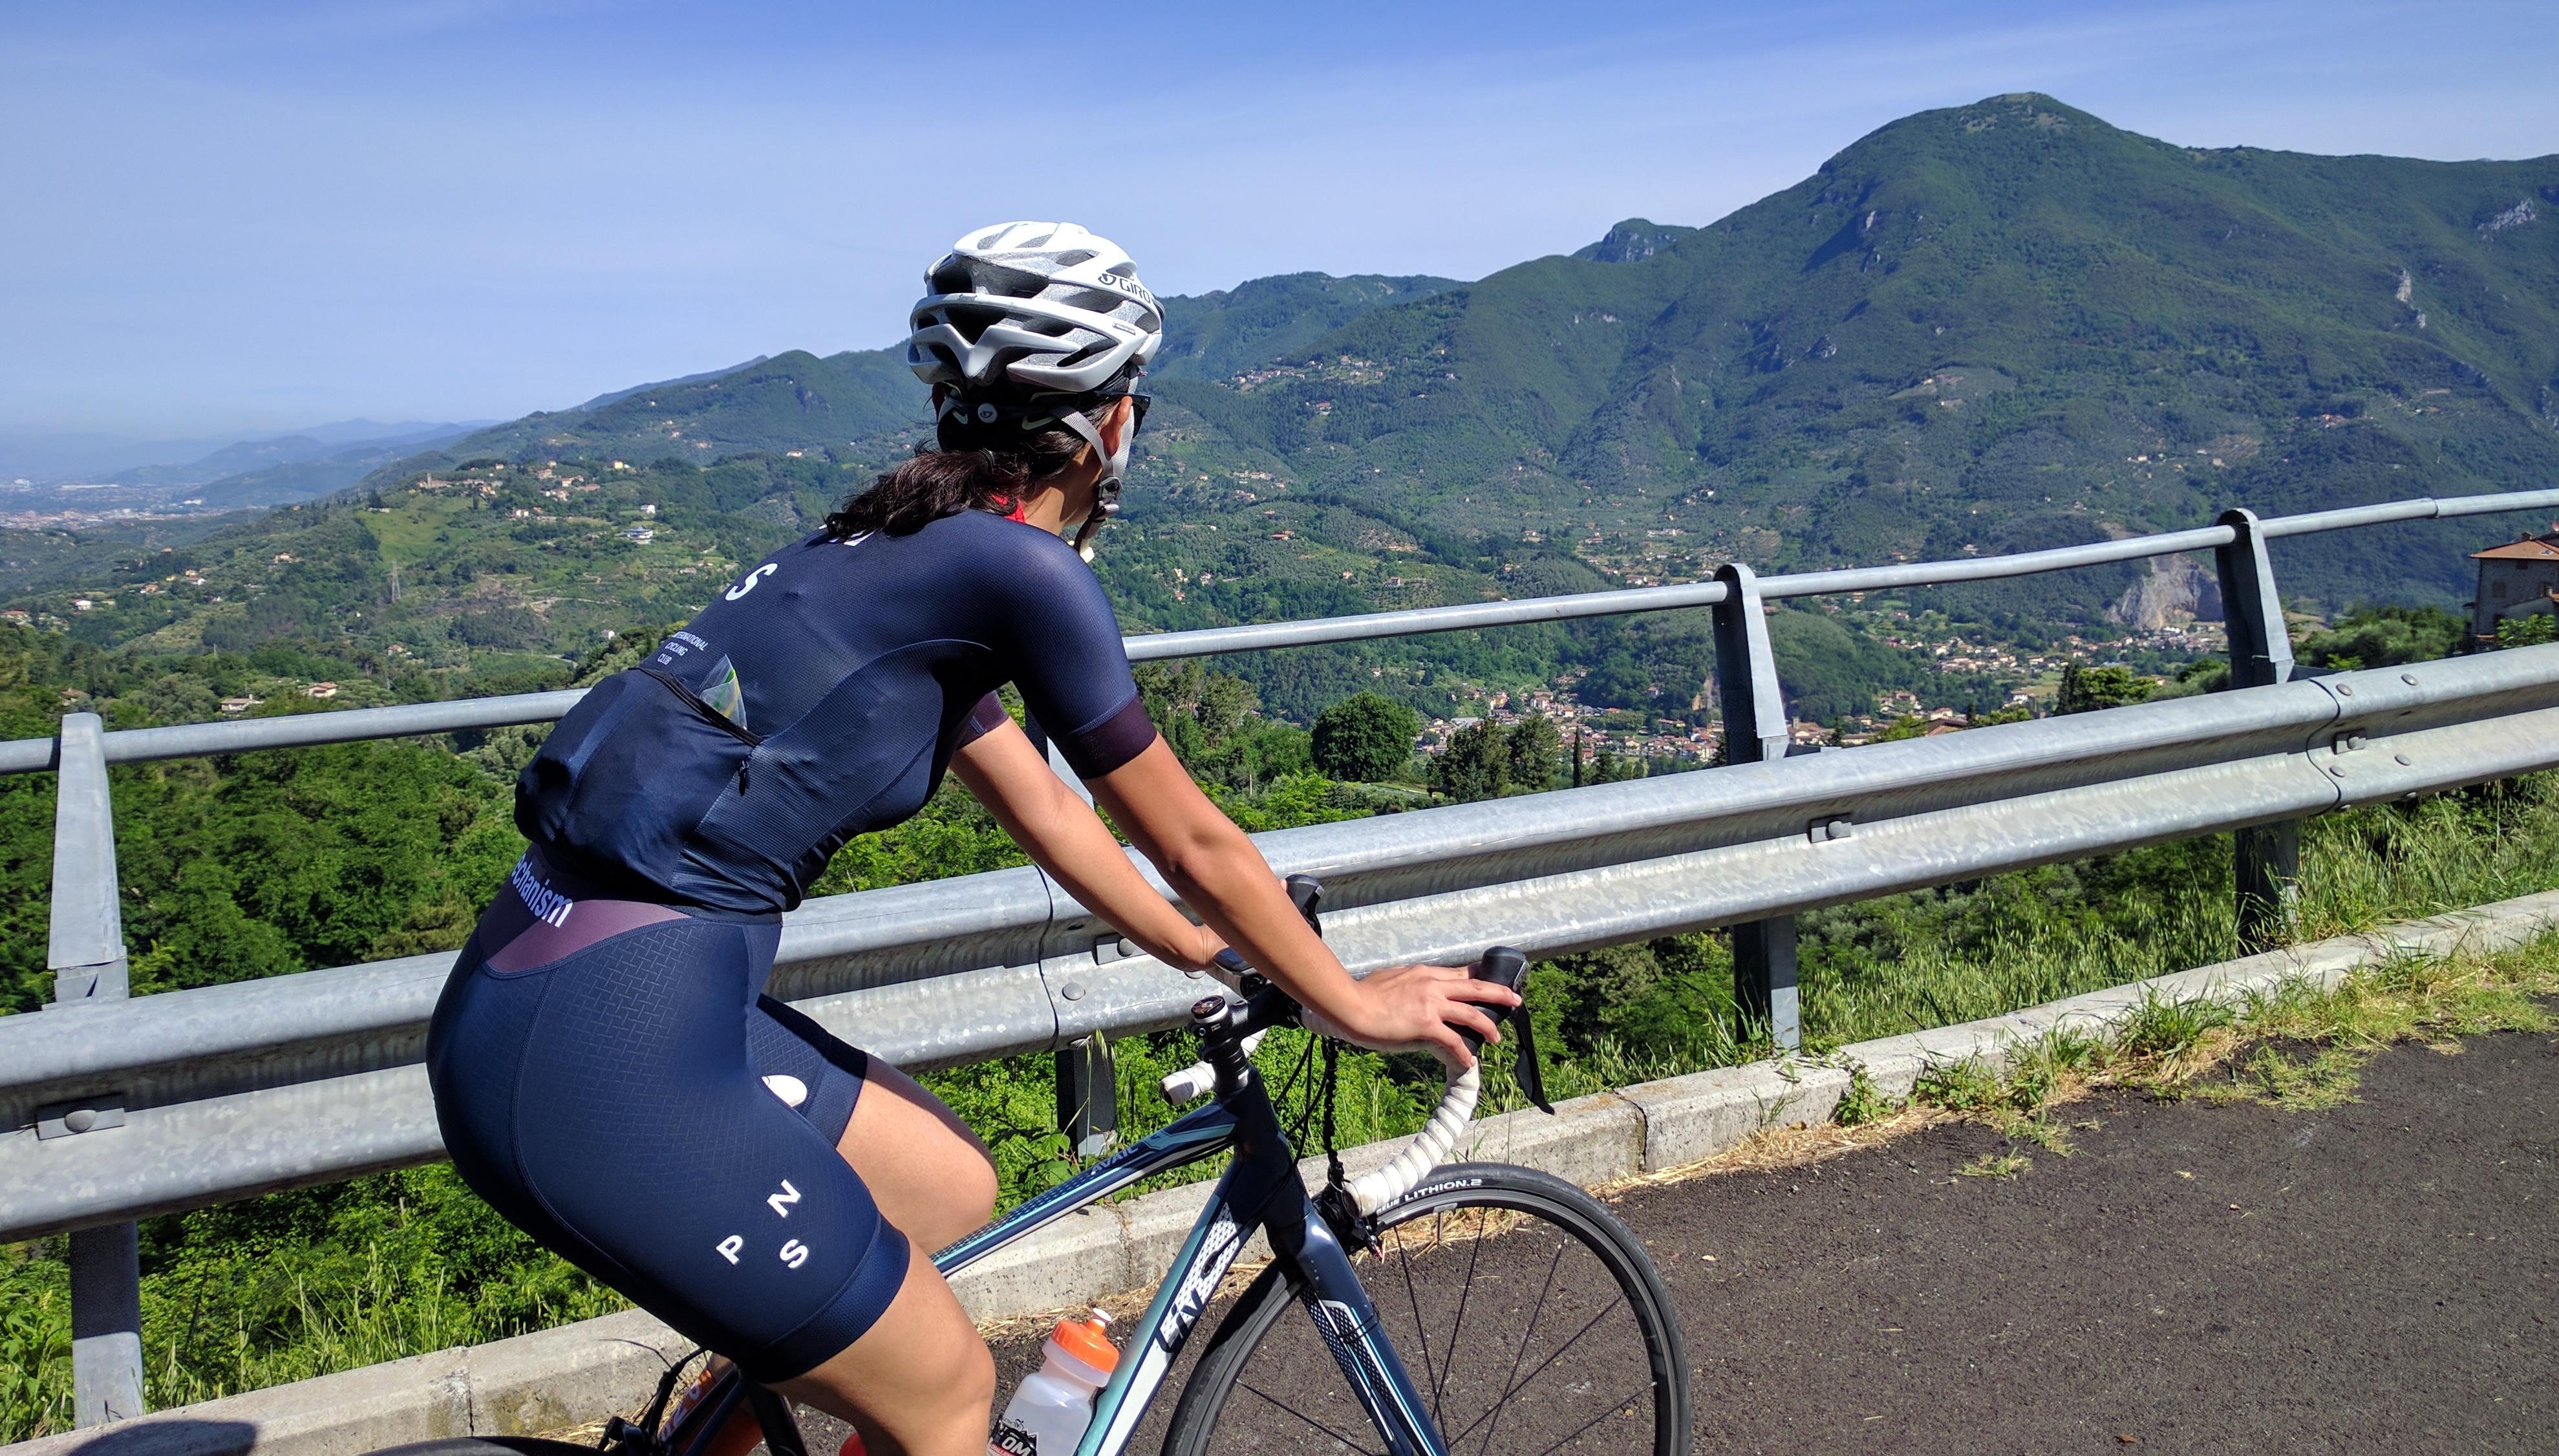 Ms. Pasquale riding Versilia's hills